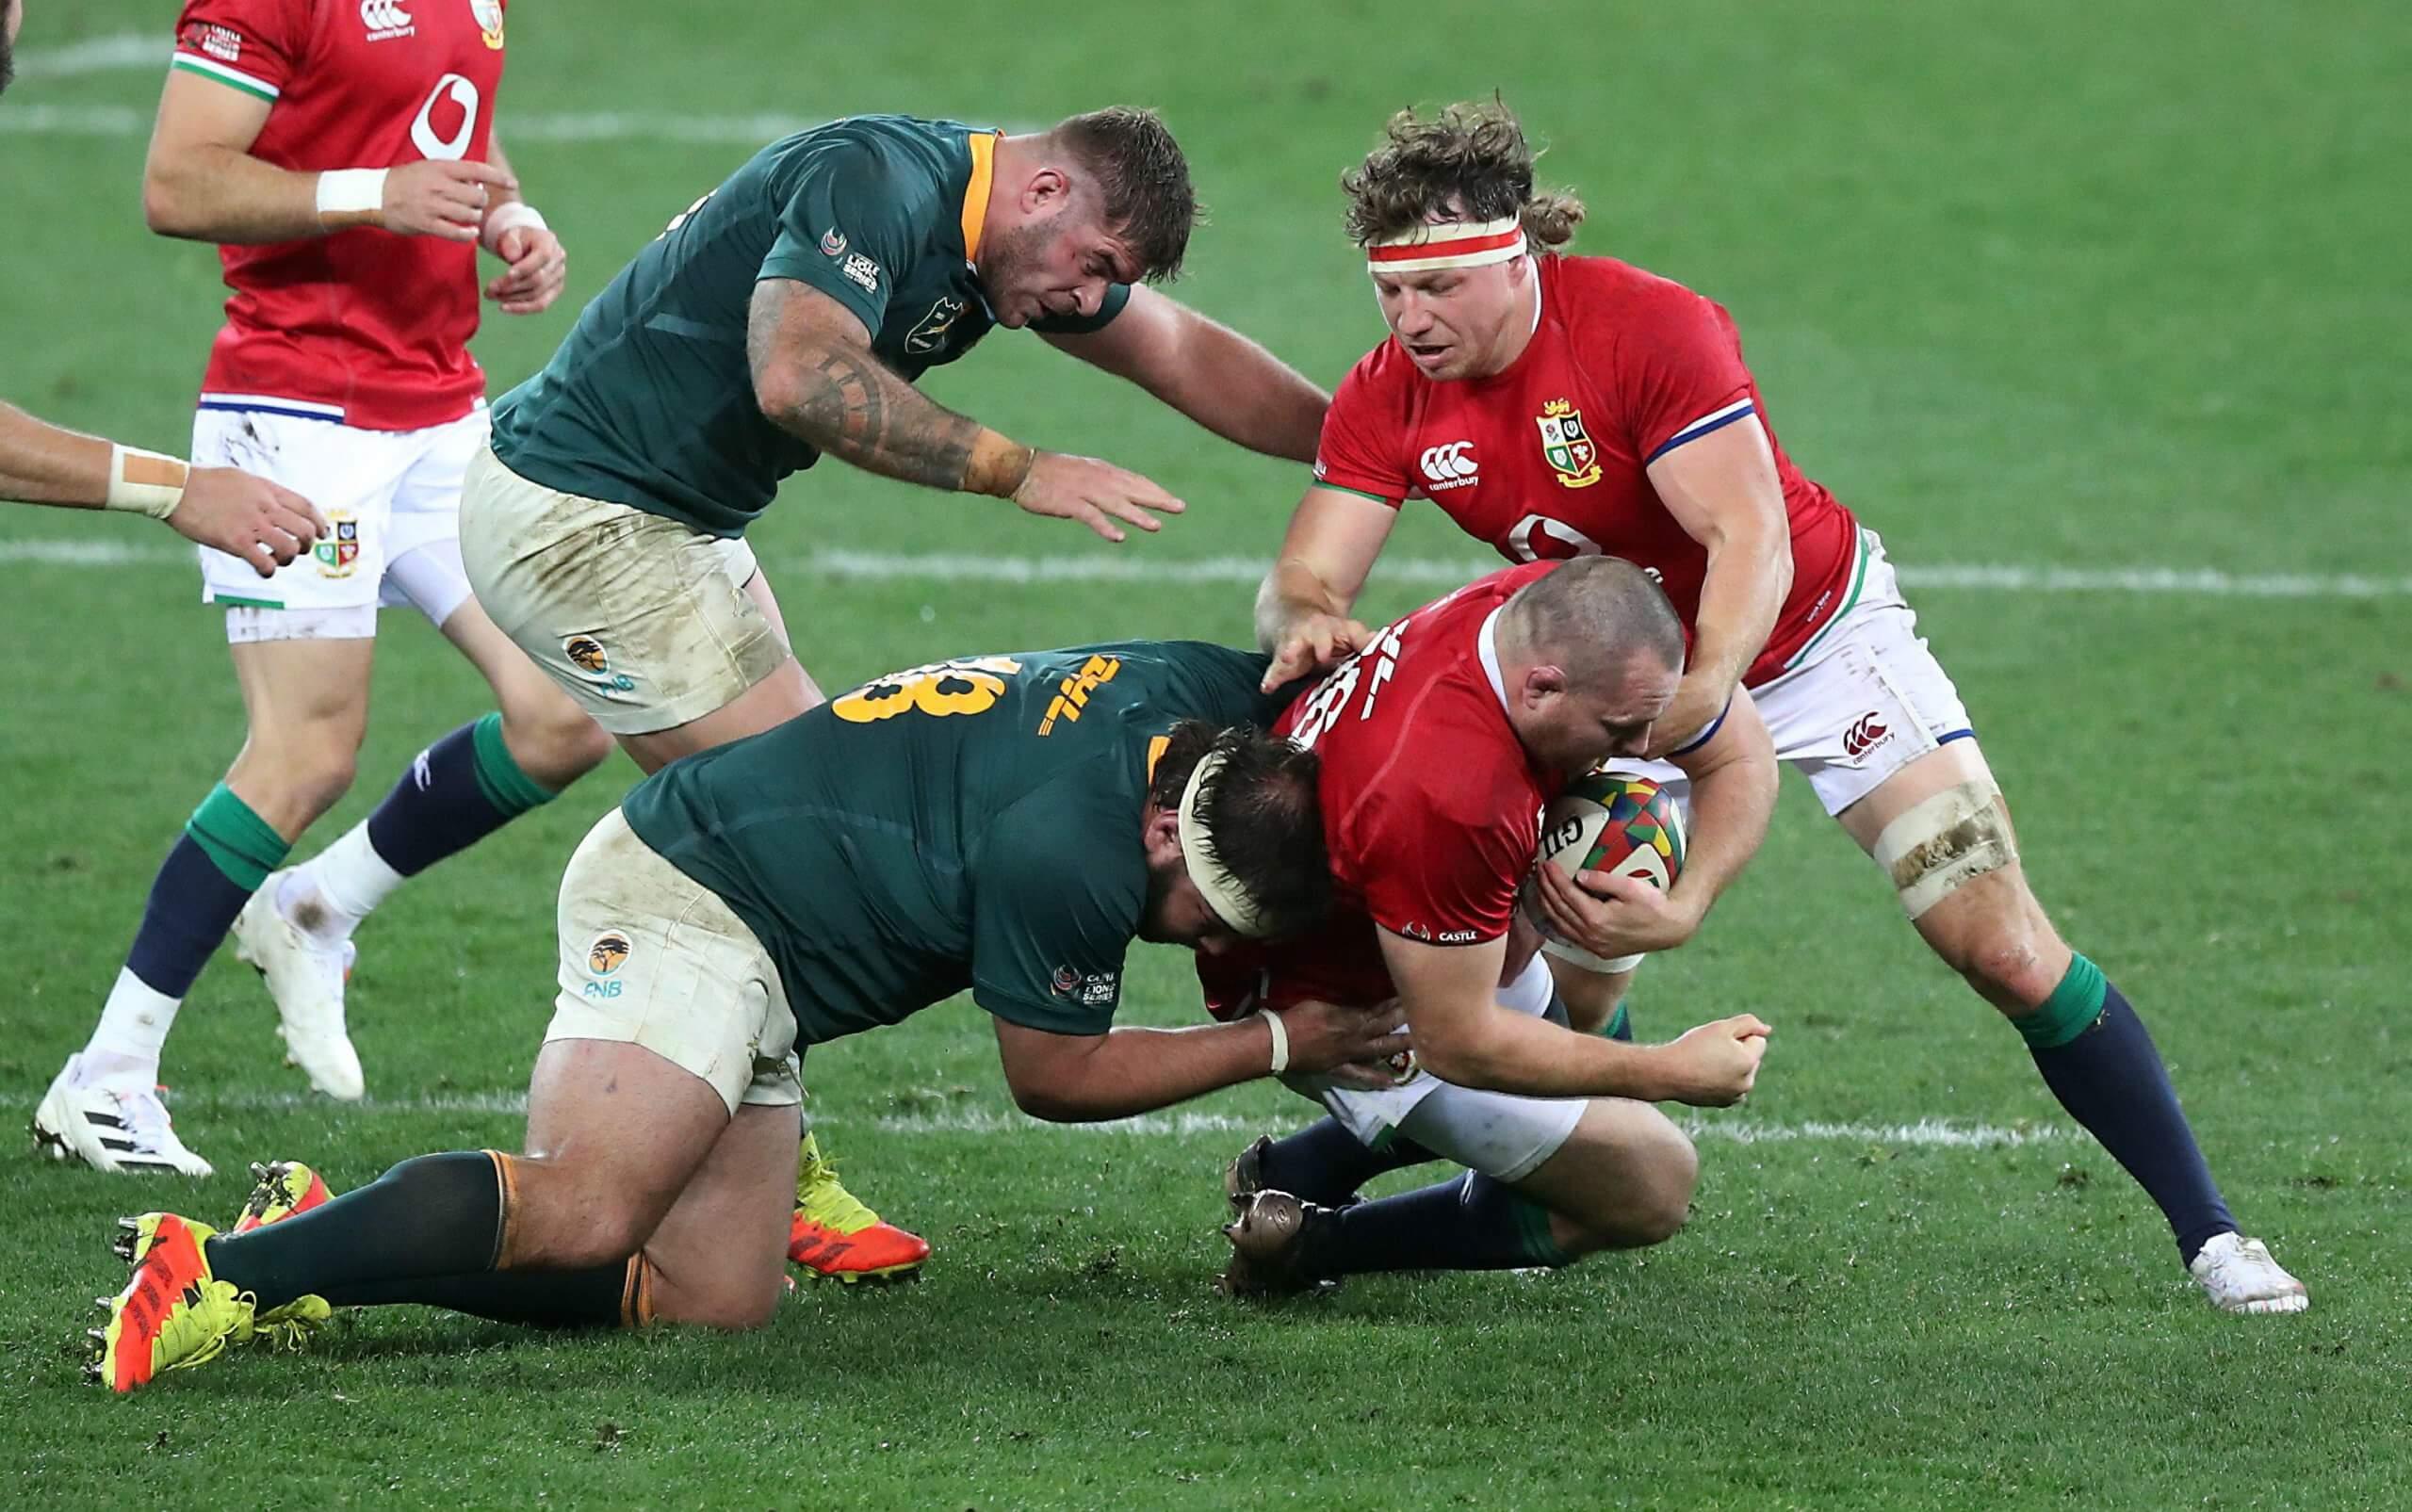 British & Irish Lions 2021 South Africa Rugby Union